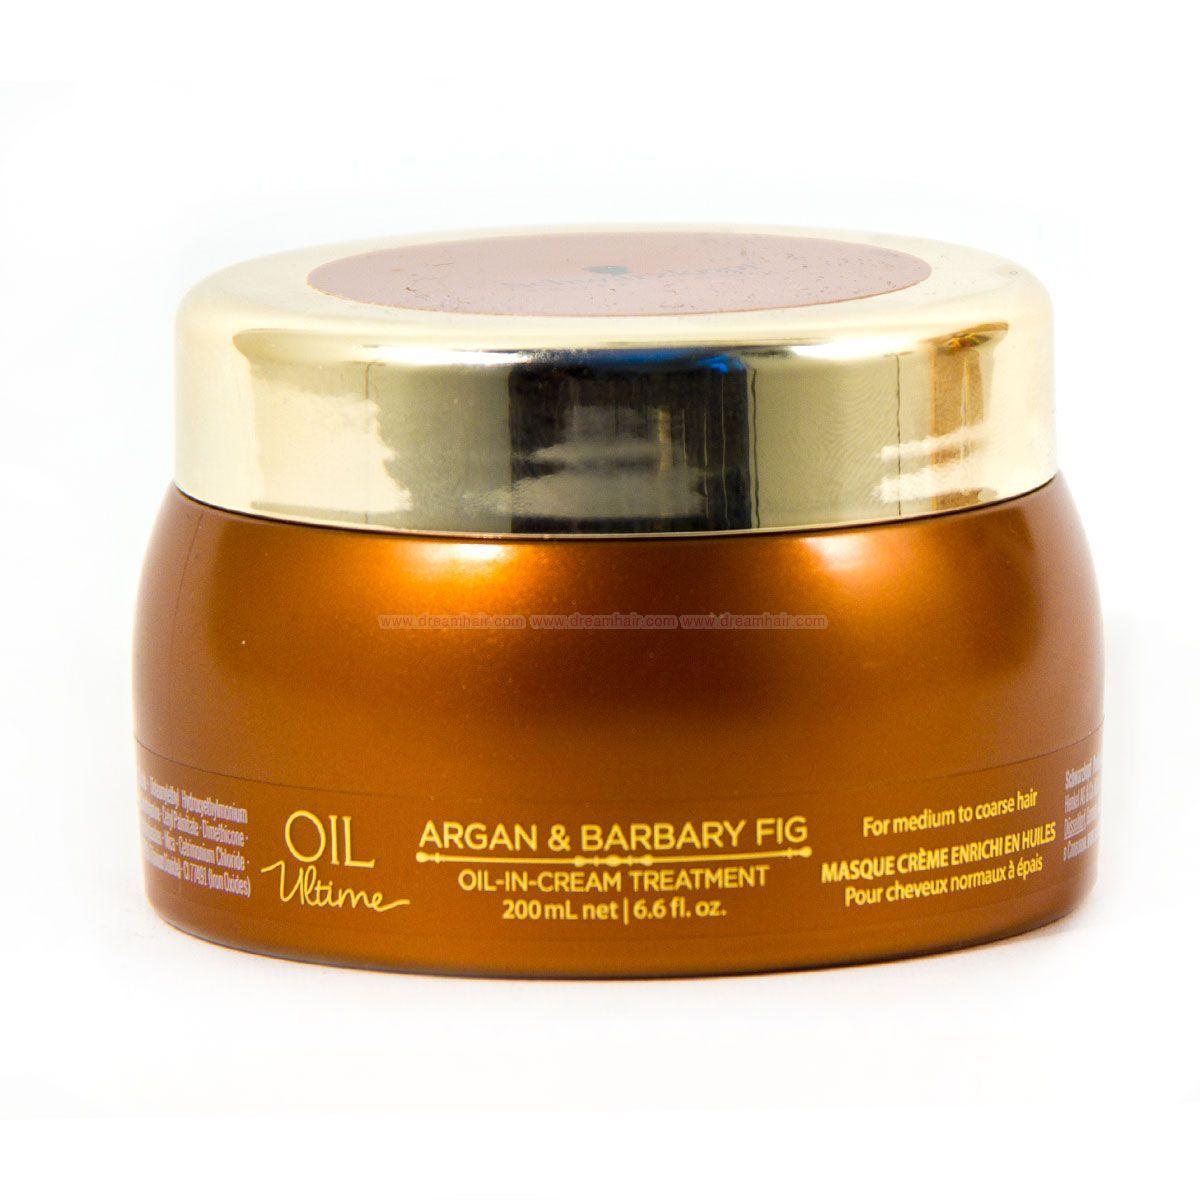 c9ced96173 Home · Hair Care · Top Brands · Schwarzkopf · Schwarzkopf Oil Ultime Argan  Oil Mask 200ml · Zoom